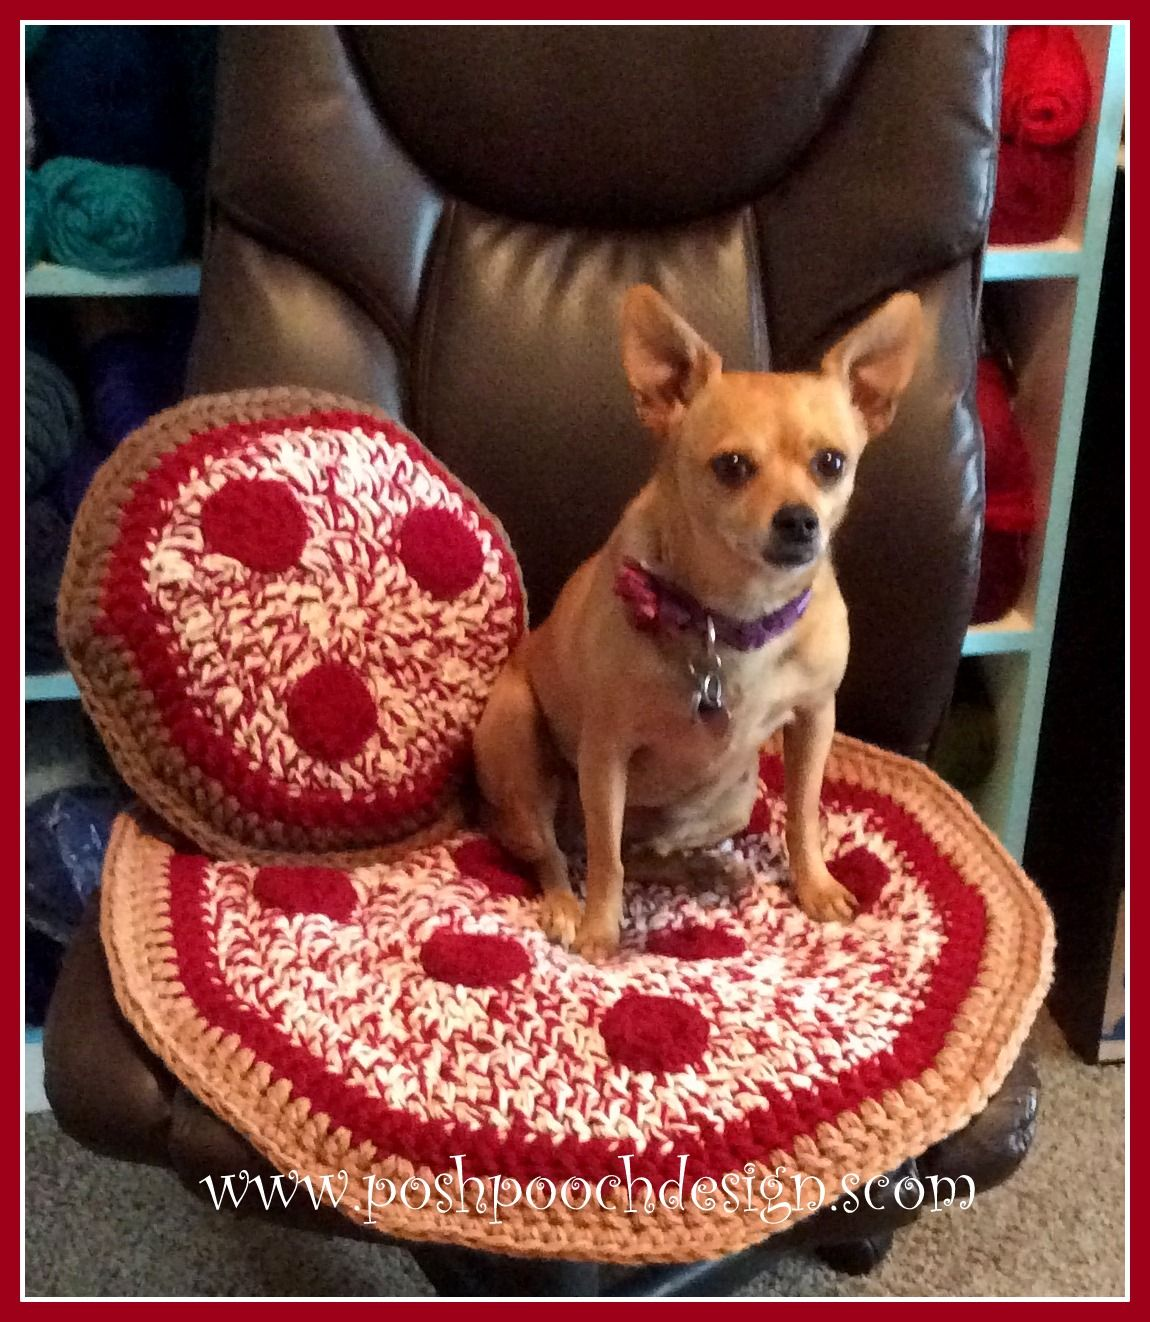 Posh Pooch Designs Dog Clothes: Pizza Pillow Crochet Pattern | Posh Pooch Designs